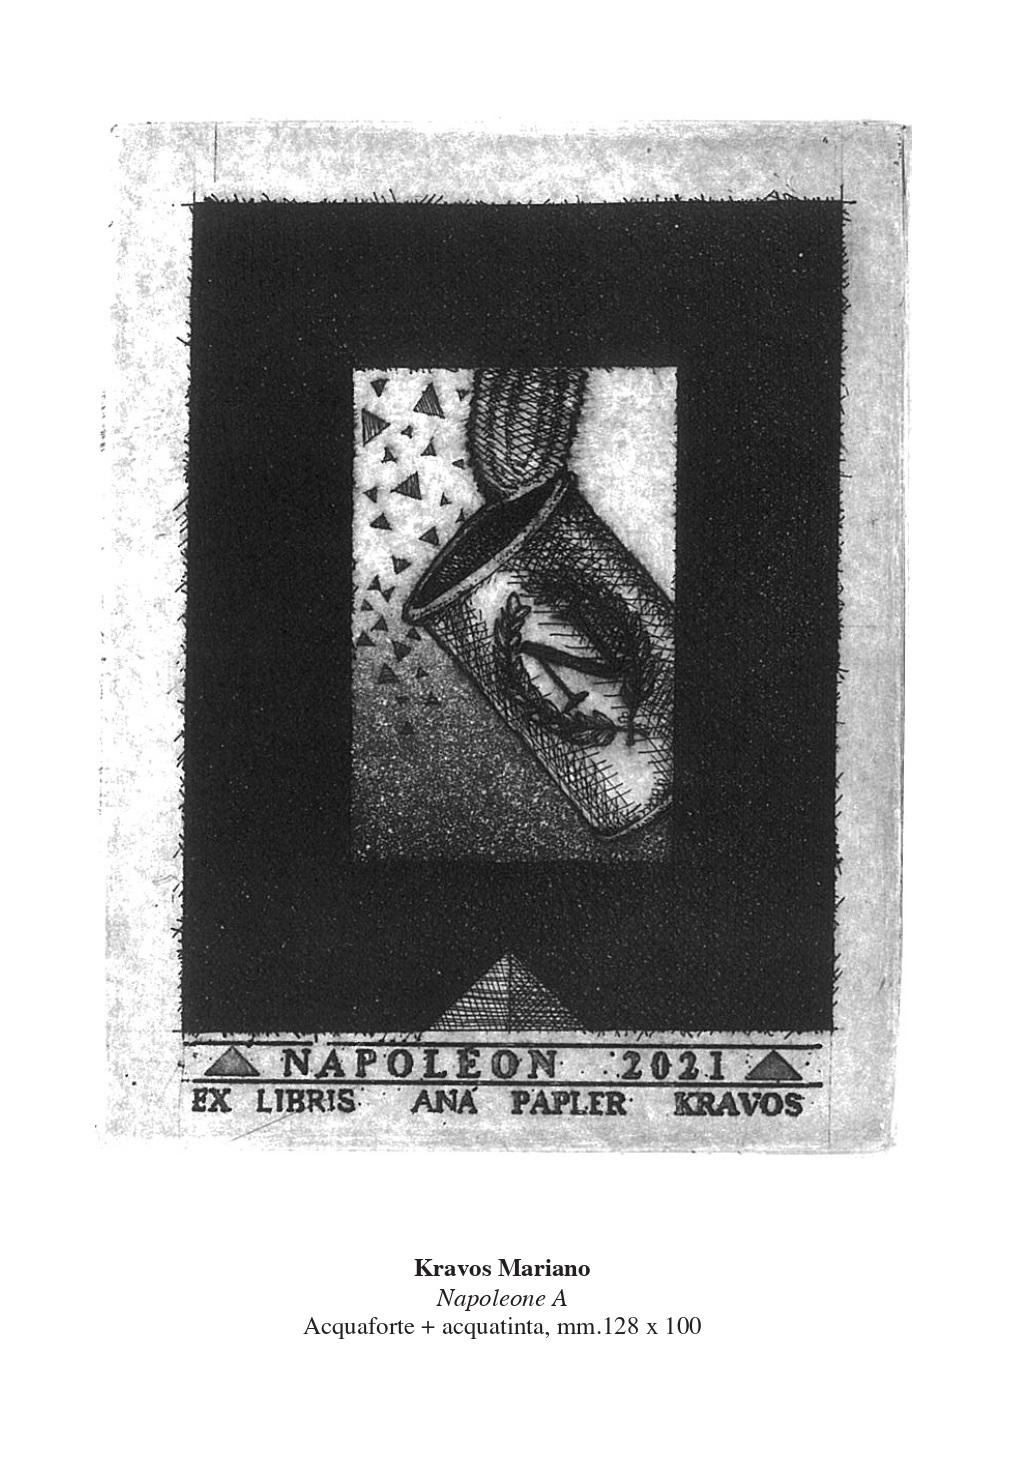 CATALOGO exlibris 2021-95_page-0001